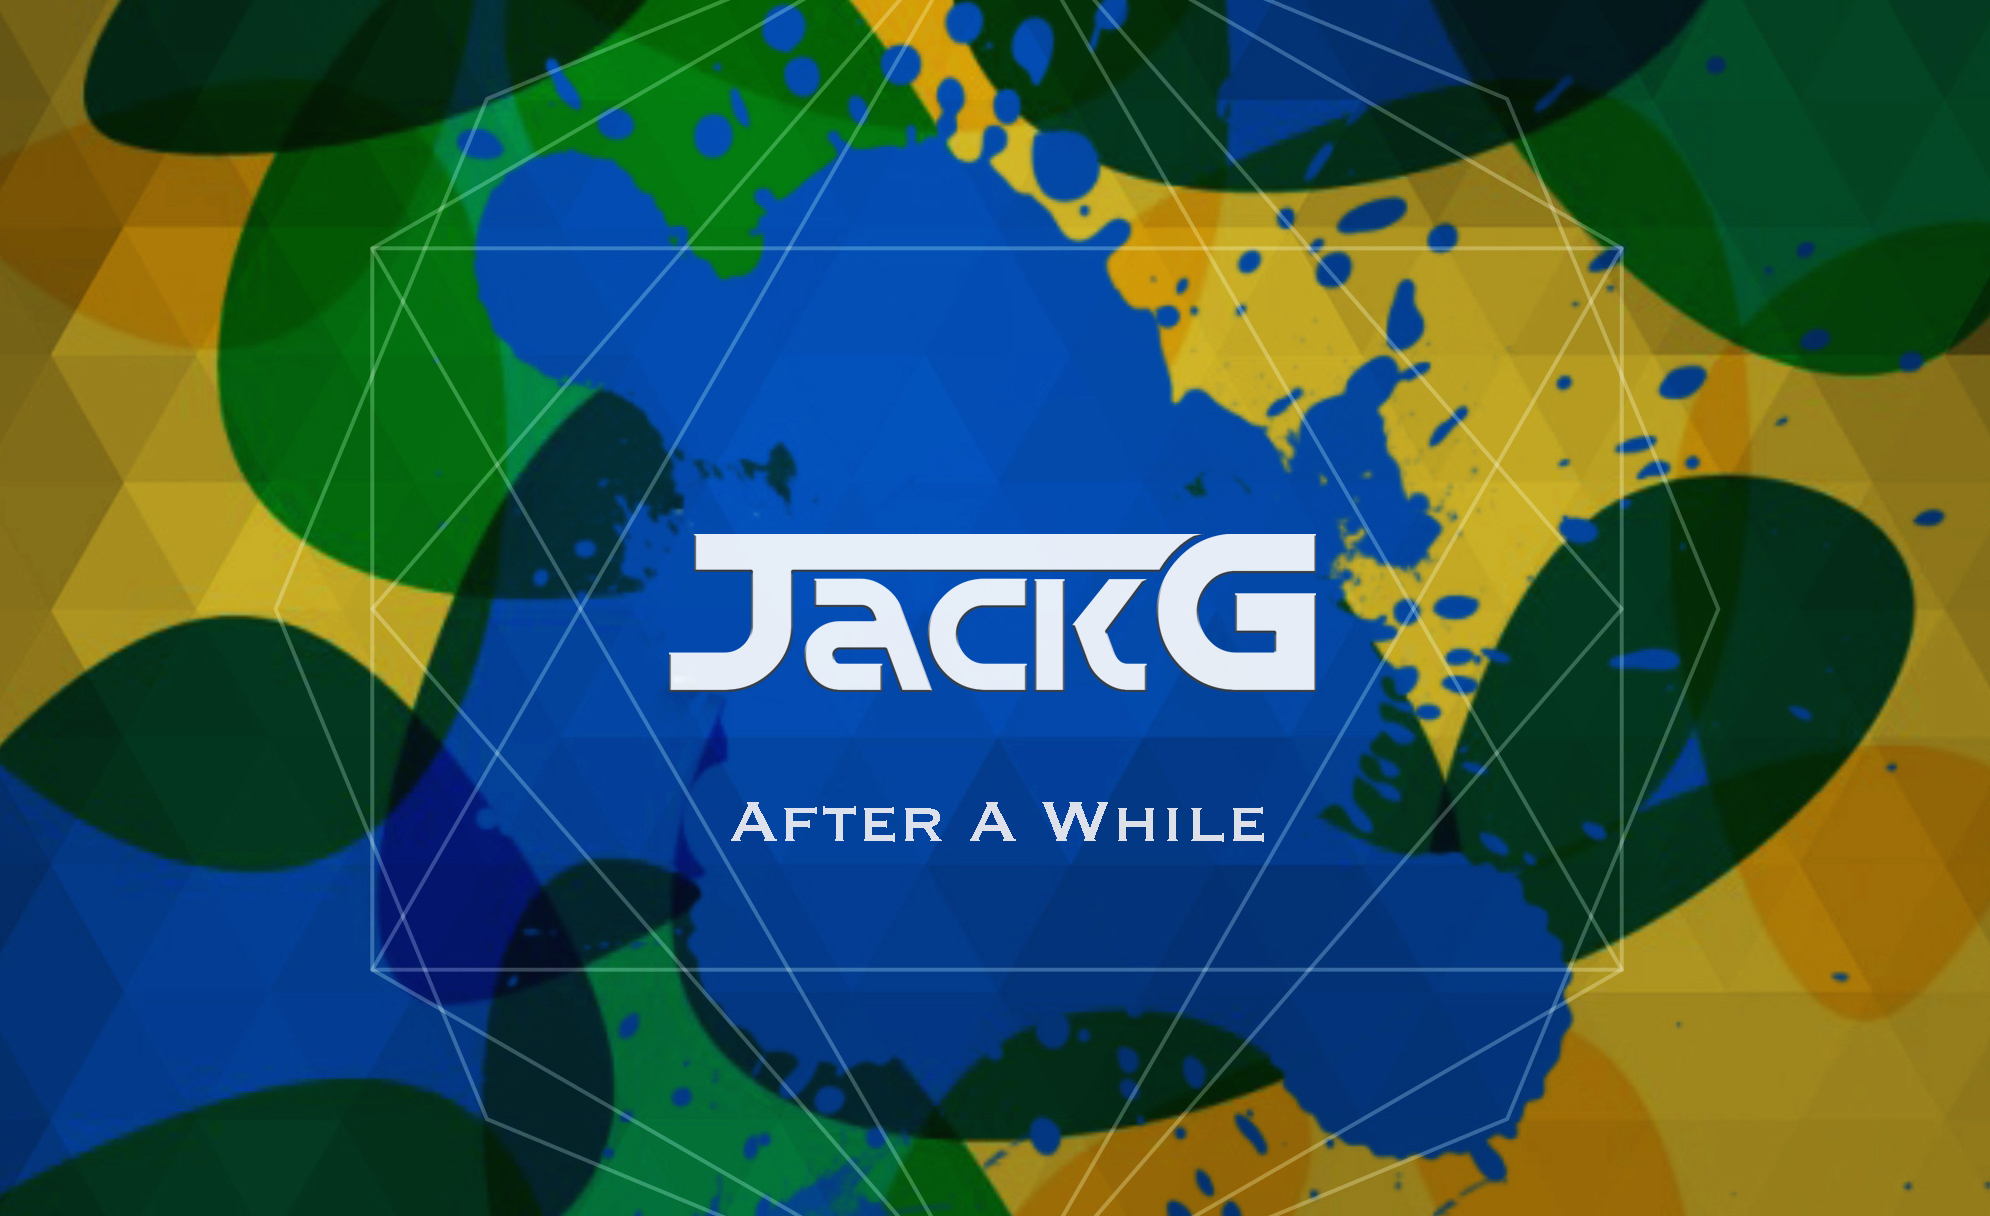 JackG em coletânea de 1 ano da Brazuka Music! Brazuka Music, bruno furlan, Dazzo, FlexB, jackg, tech house